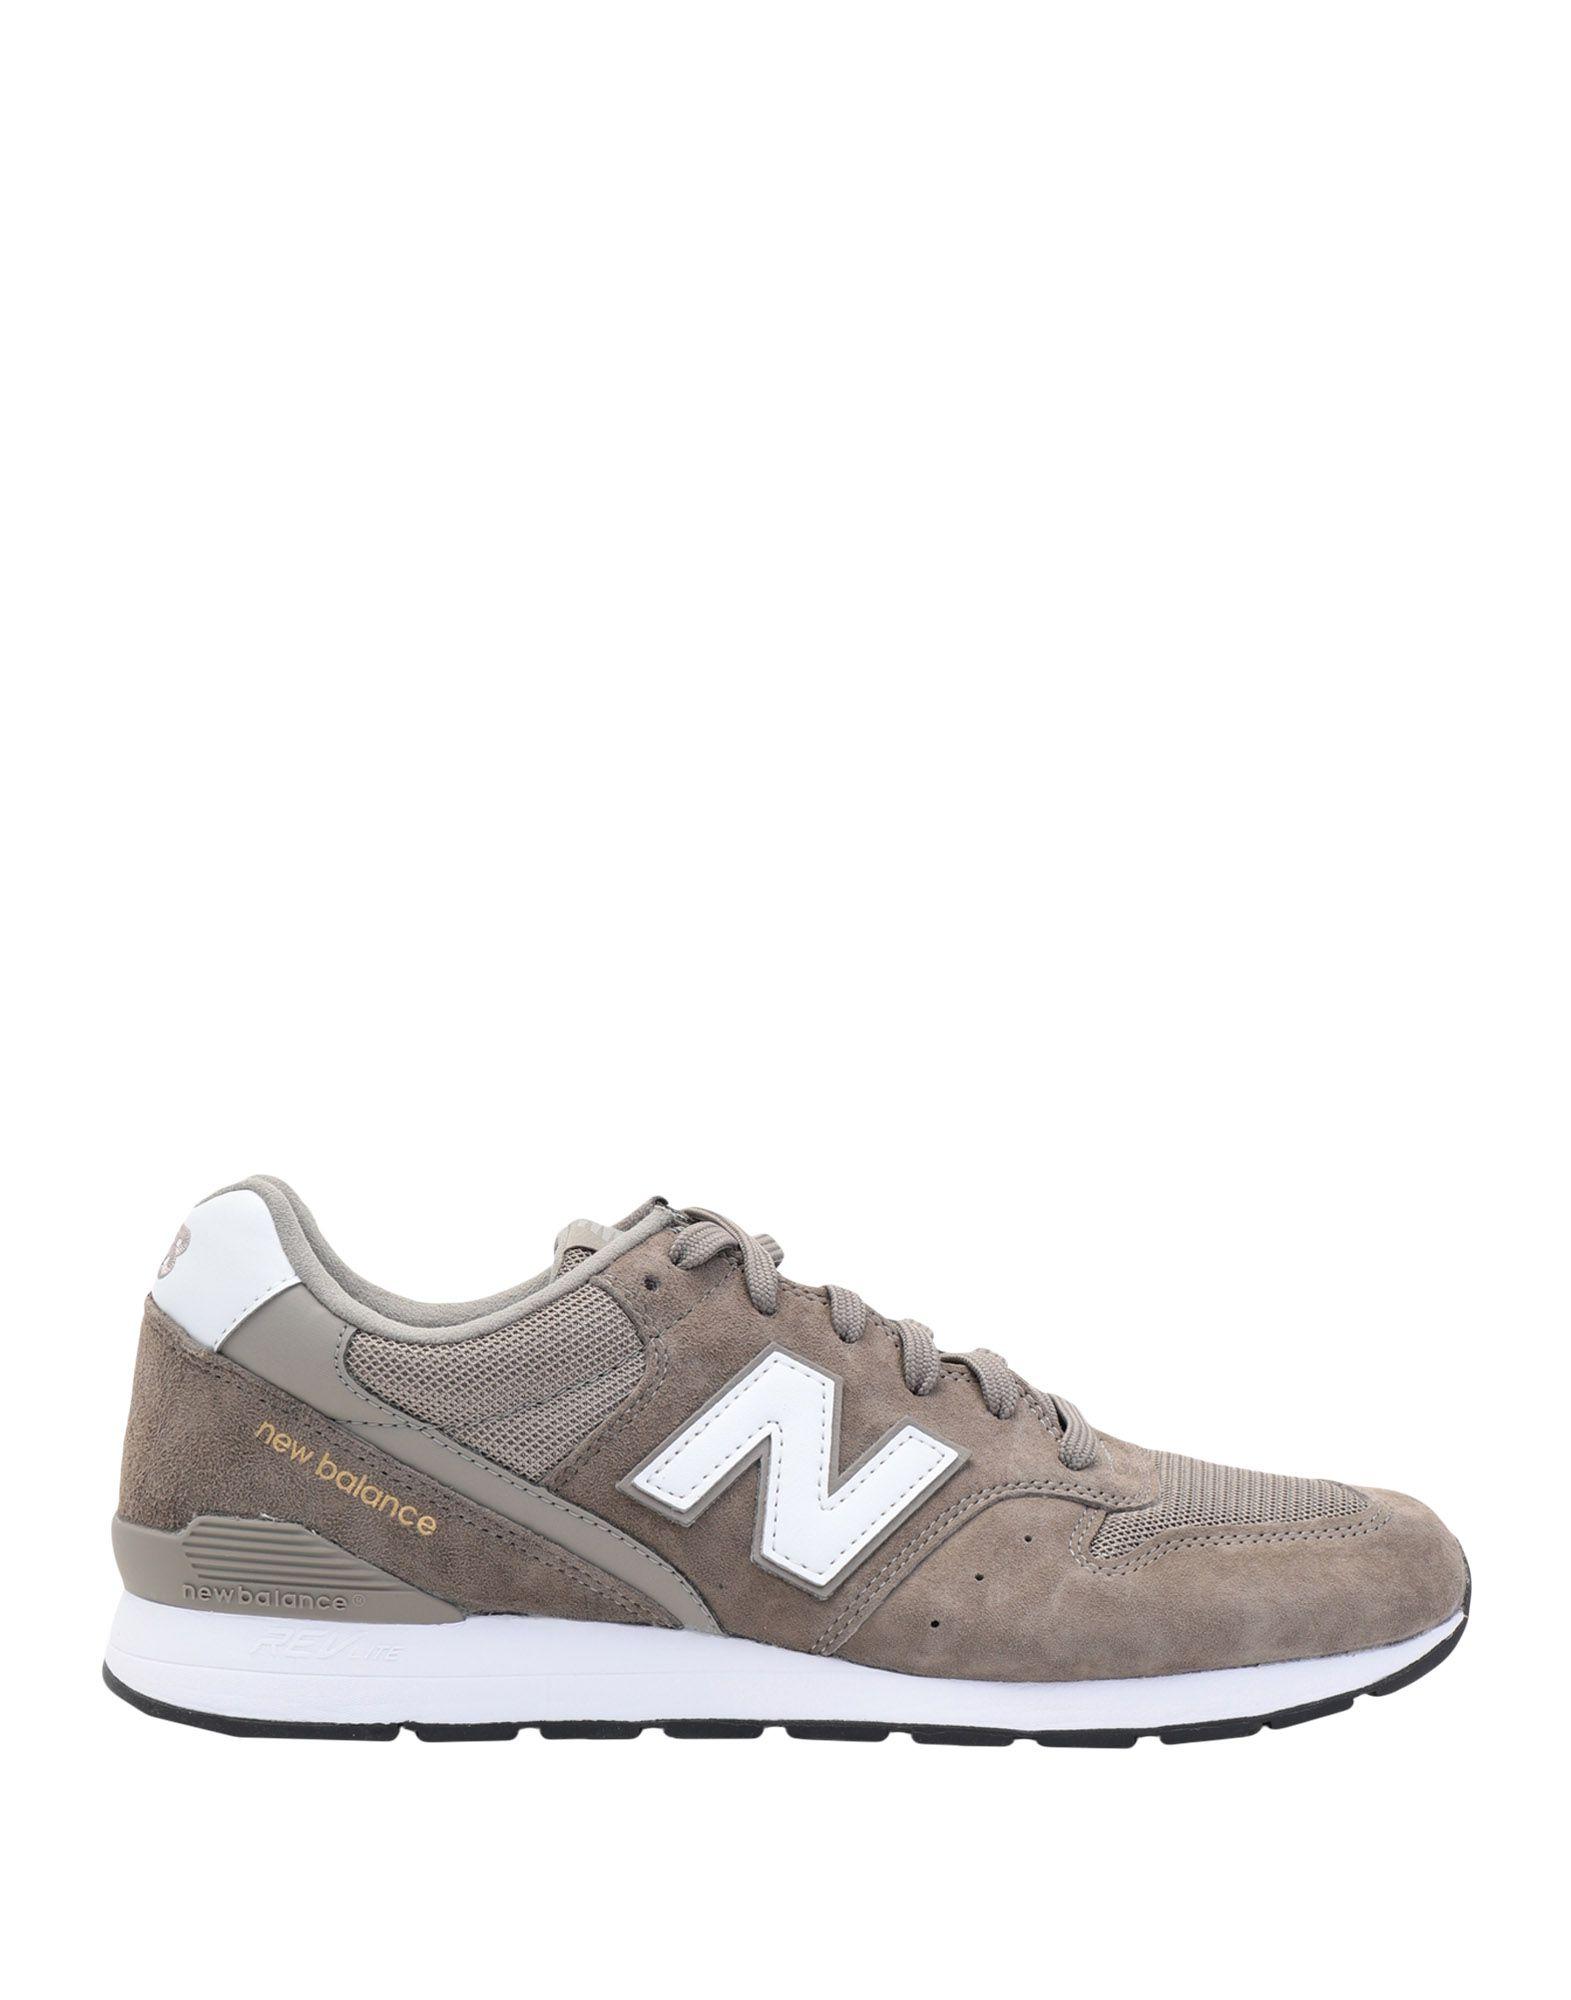 NEW BALANCE Низкие кеды и кроссовки кроссовки женские new balance 996 цвет серый wr996nec d размер 8 5 39